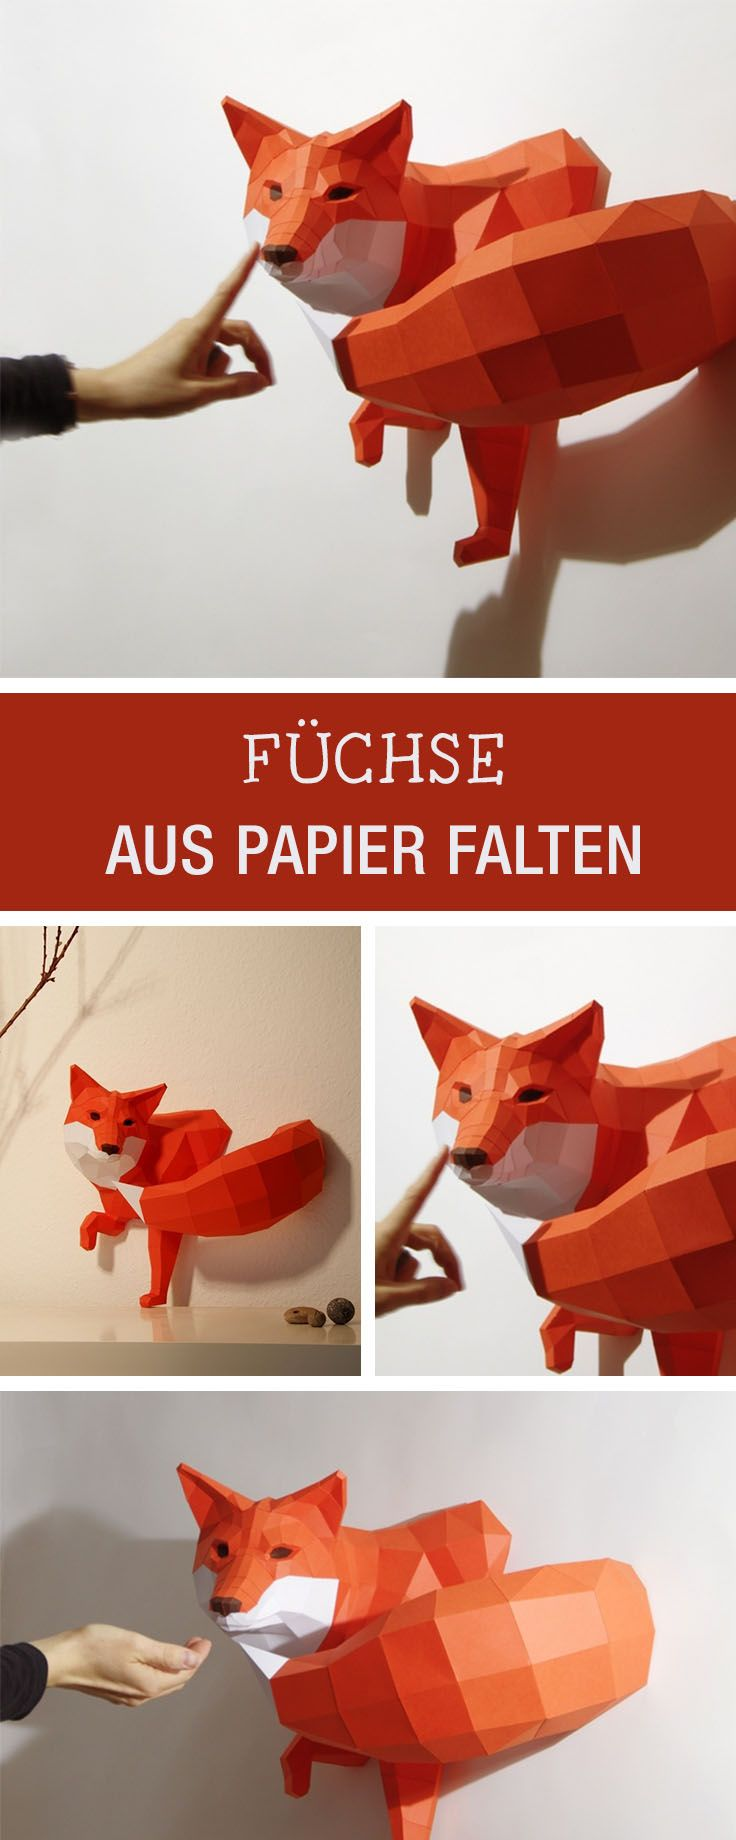 medium resolution of diy f r einen origami fuchs als originelle wohndeko craft an origami fox made of paper home decor via dawanda com